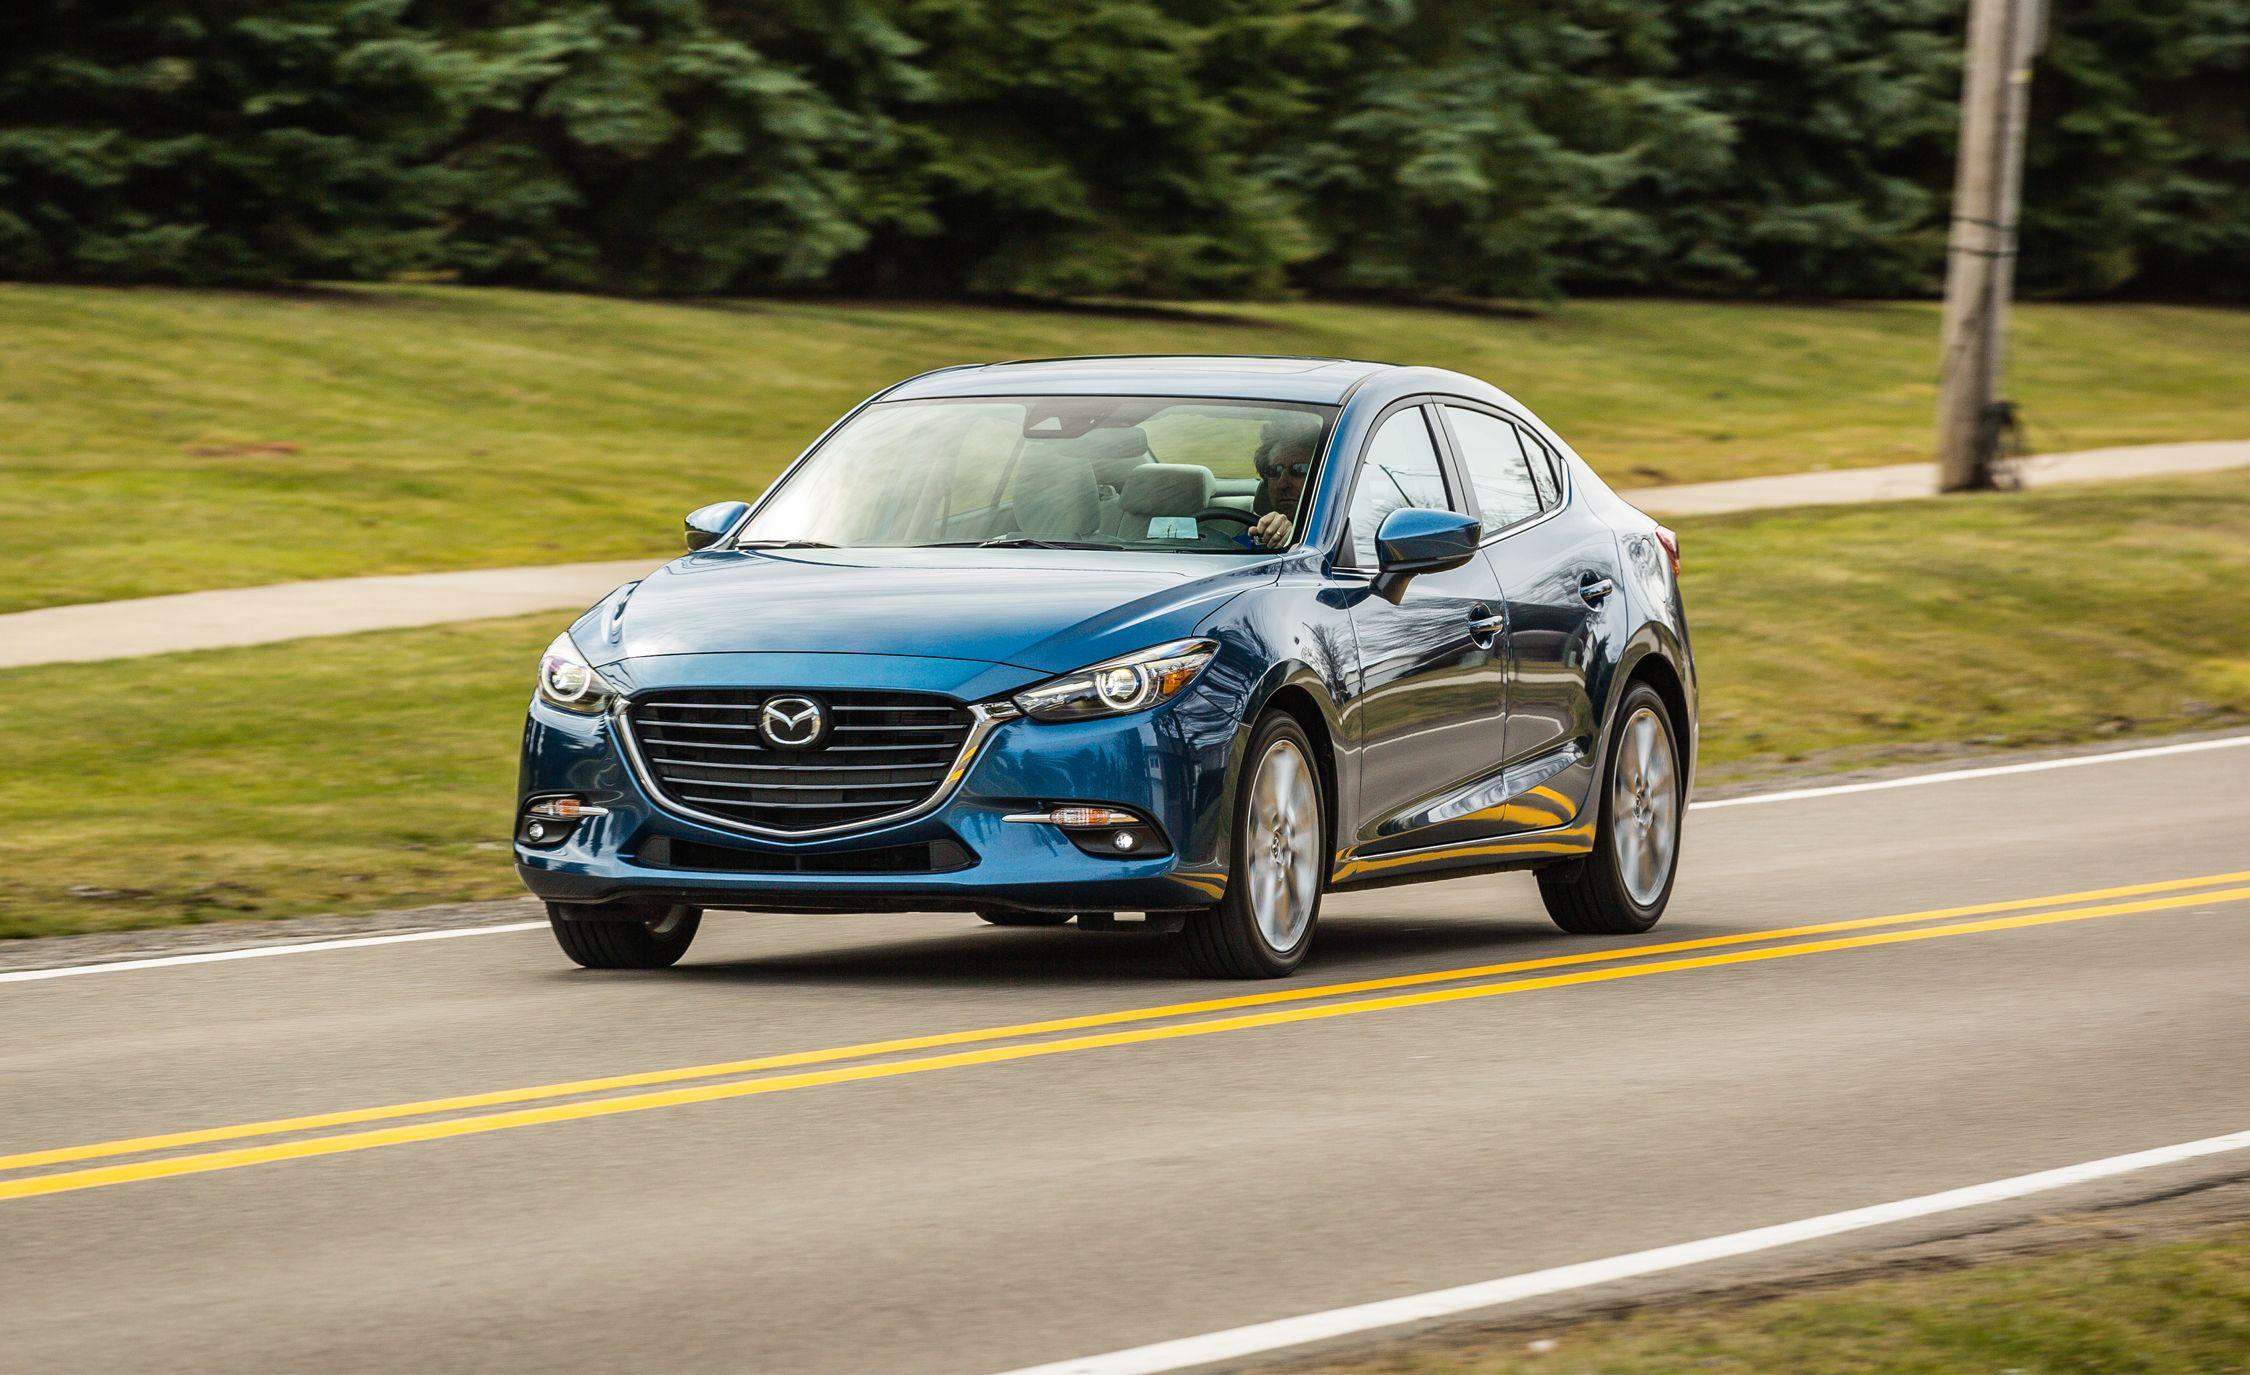 2017 Mazda 3 2.5L Automatic Sedan